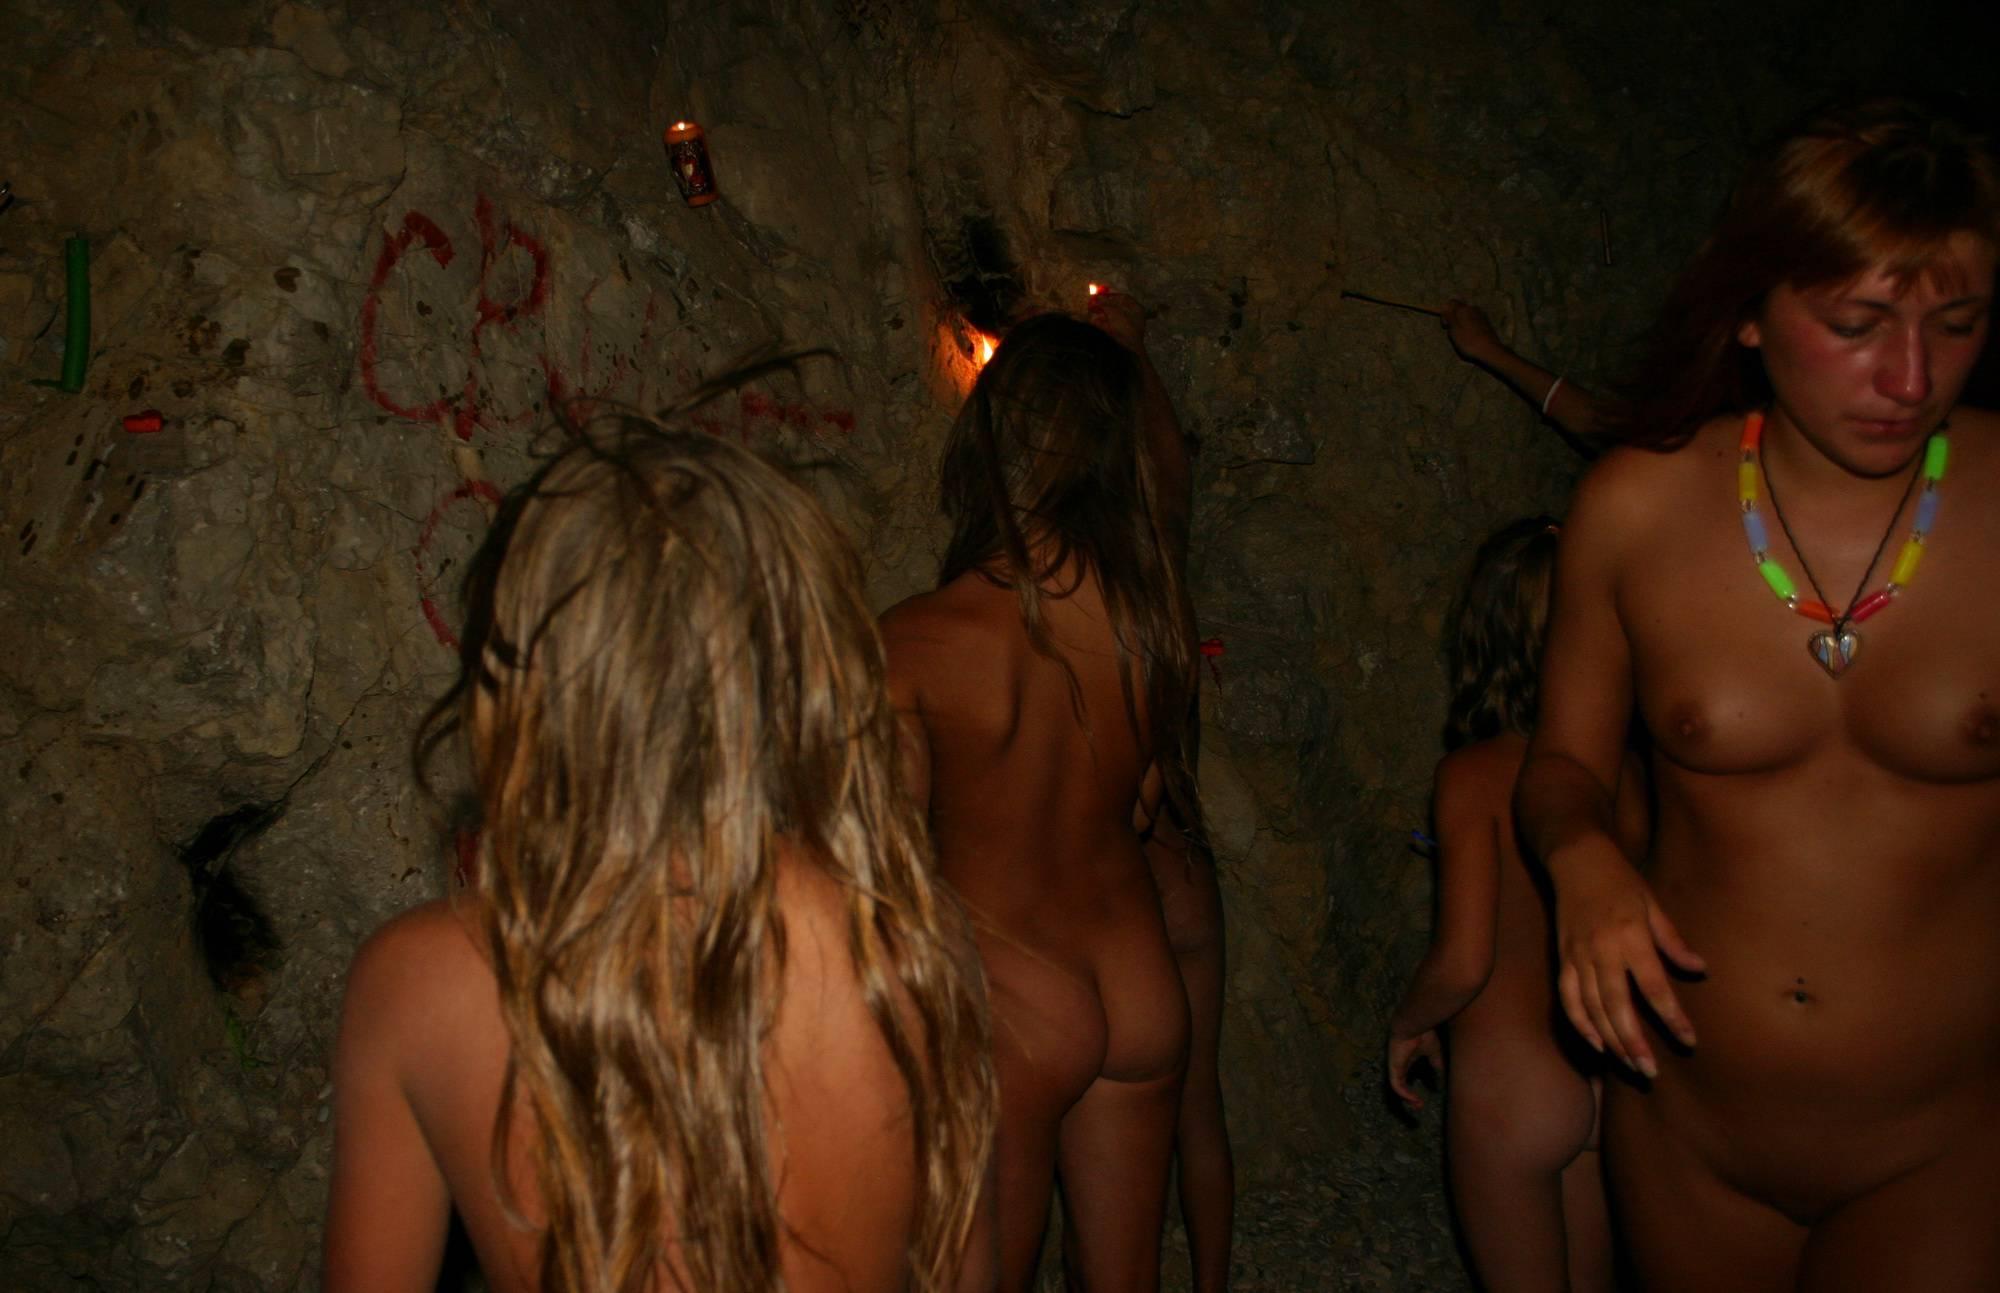 Nudist Photos Cavewall Night Family Shot - 1